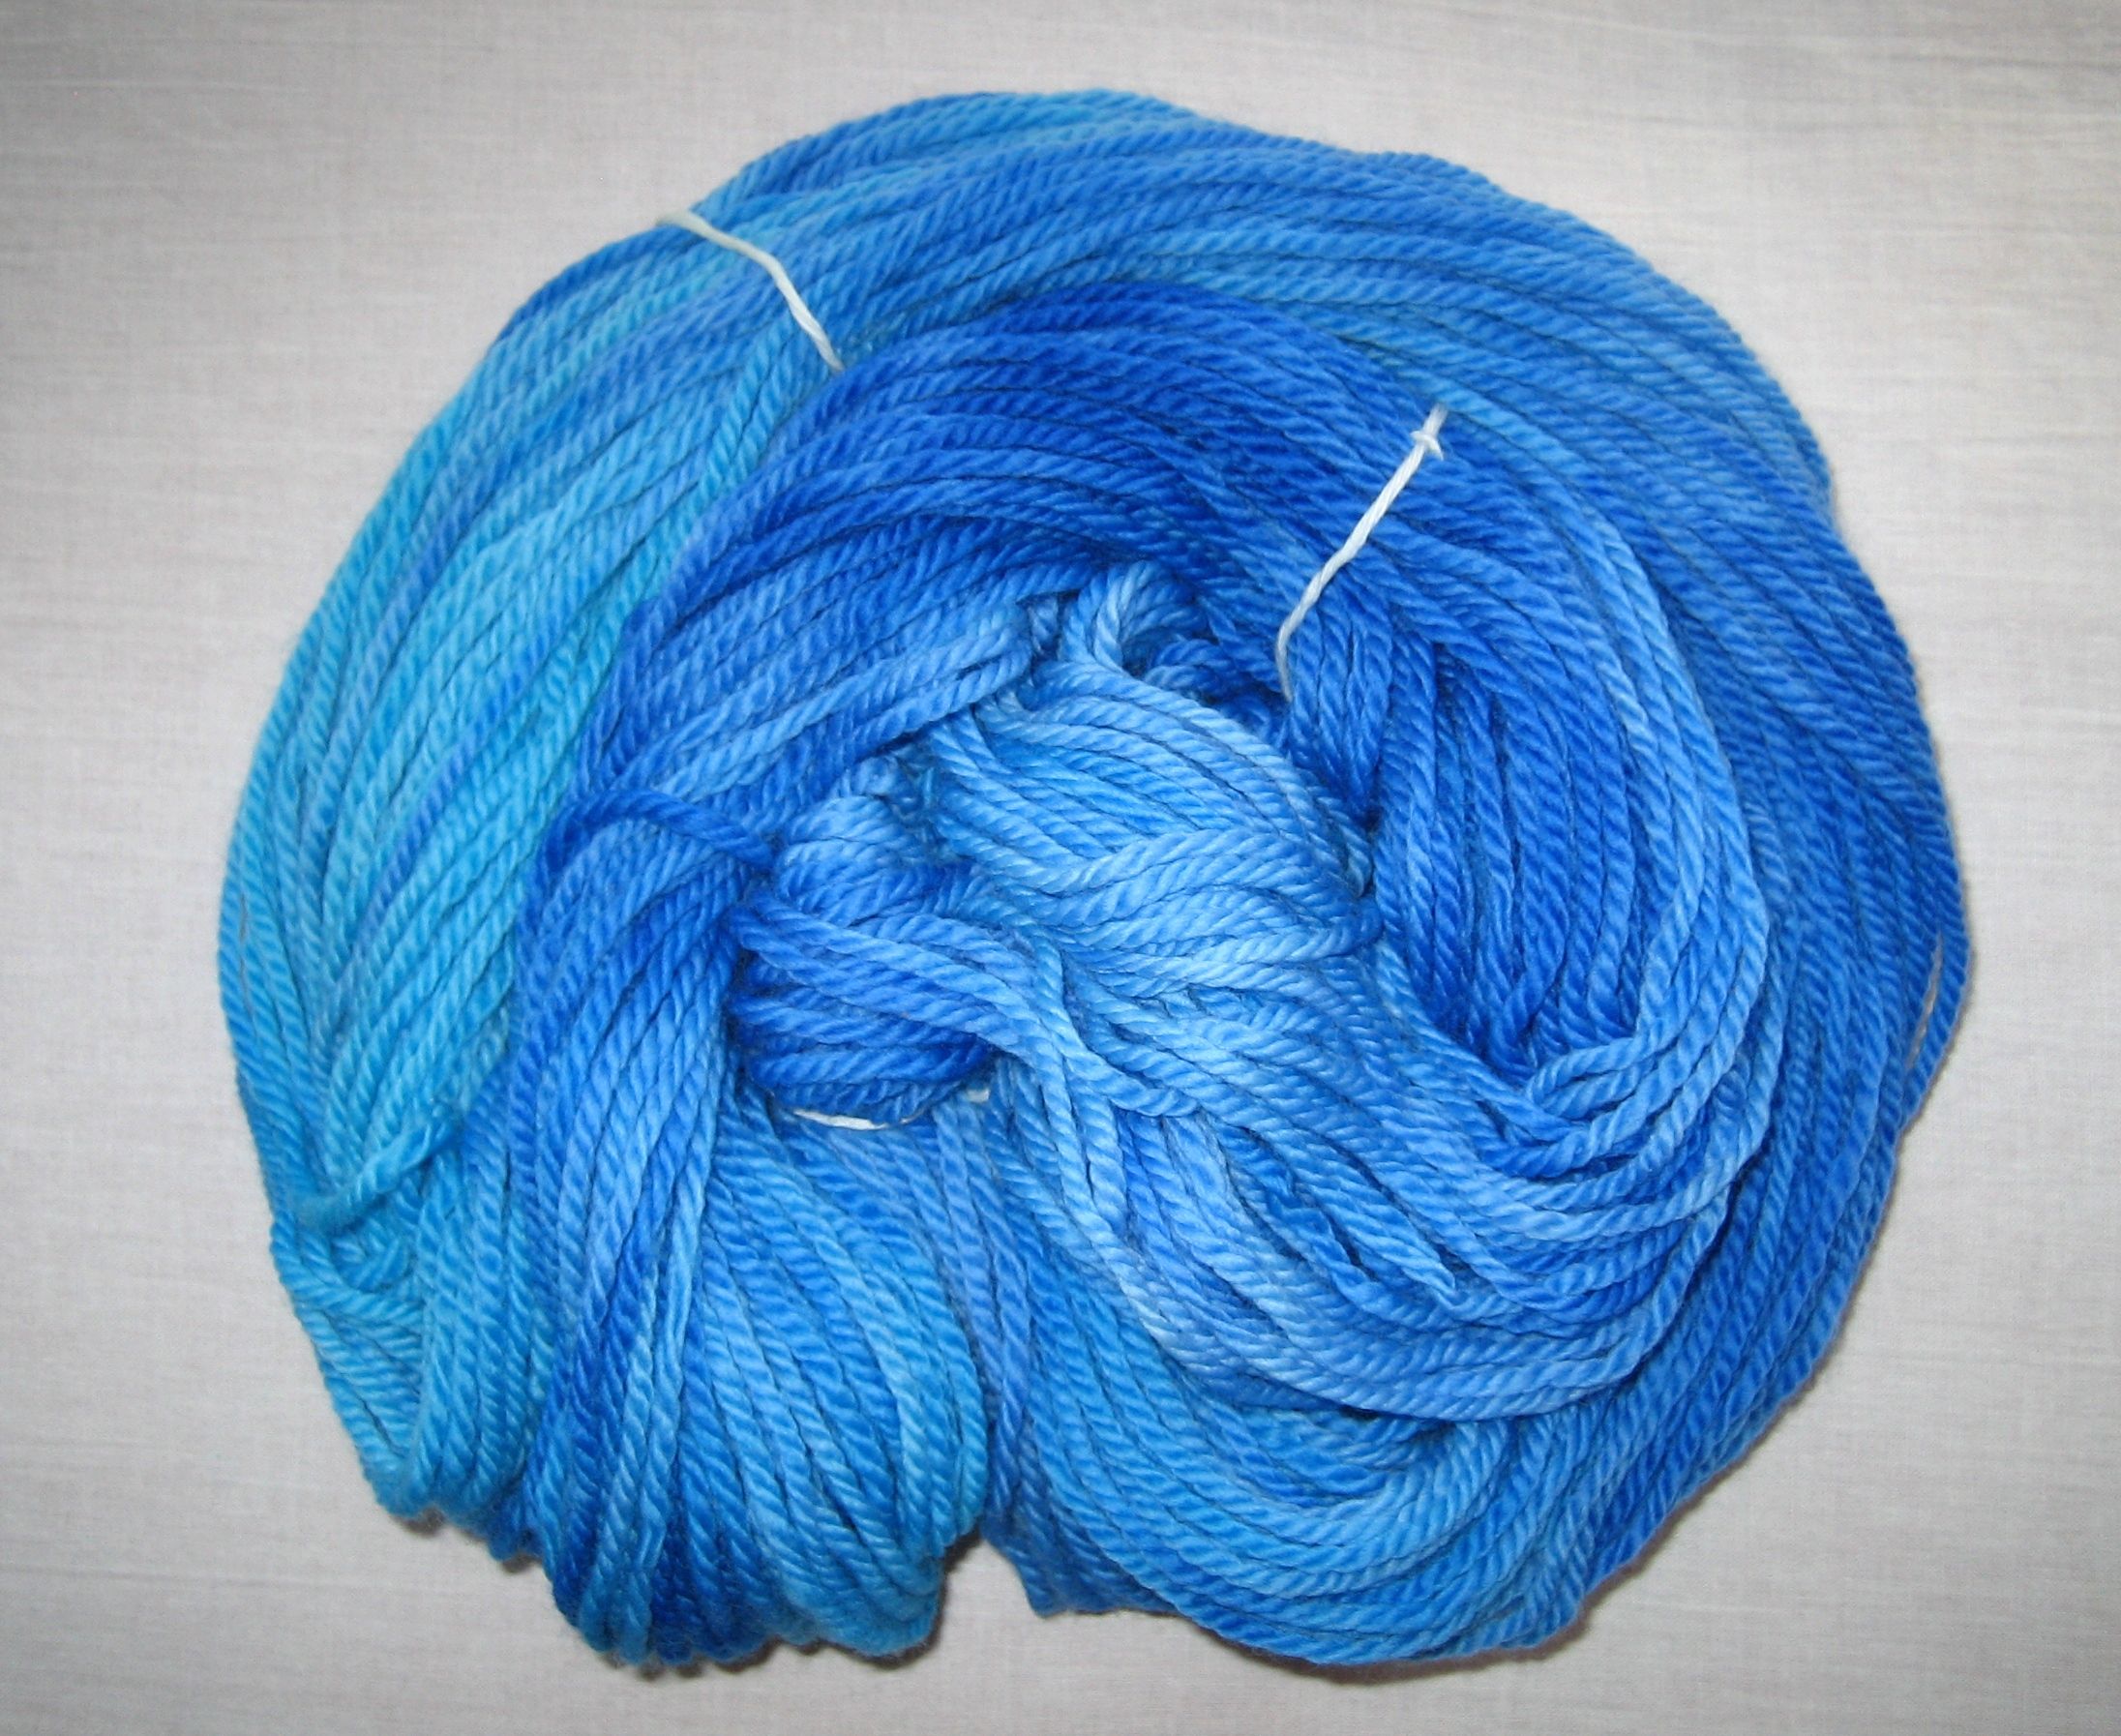 garnyarn-håndfarvet-garn-tyk-merinould-superwash-blaa